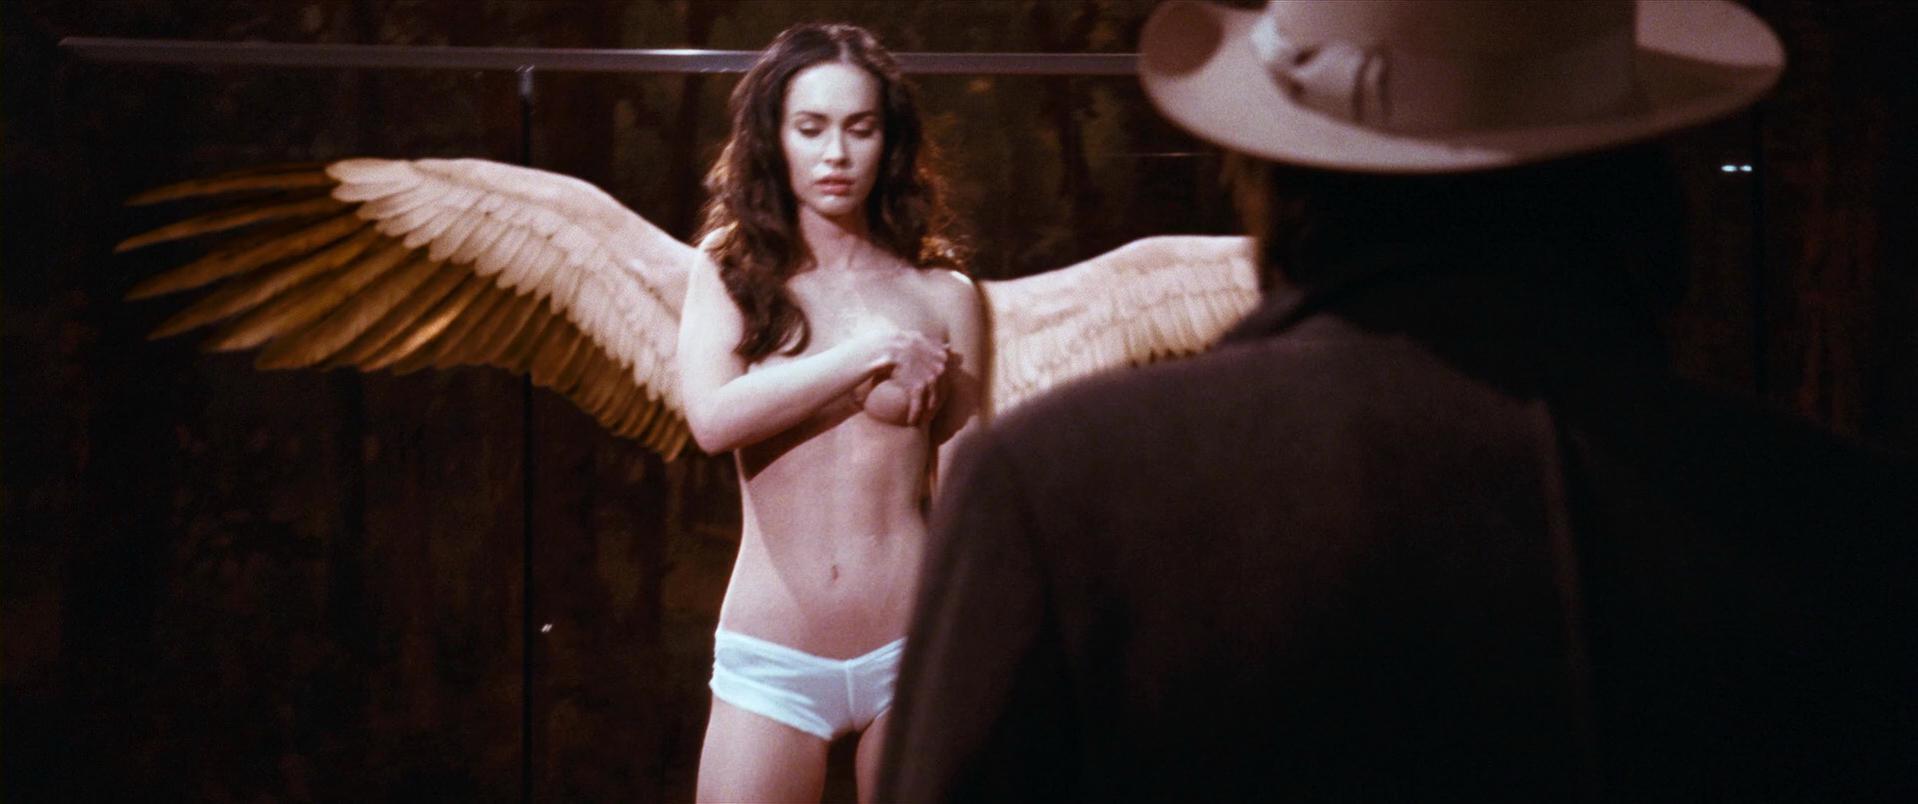 Megan Fox sexy - Passion Play (2010)